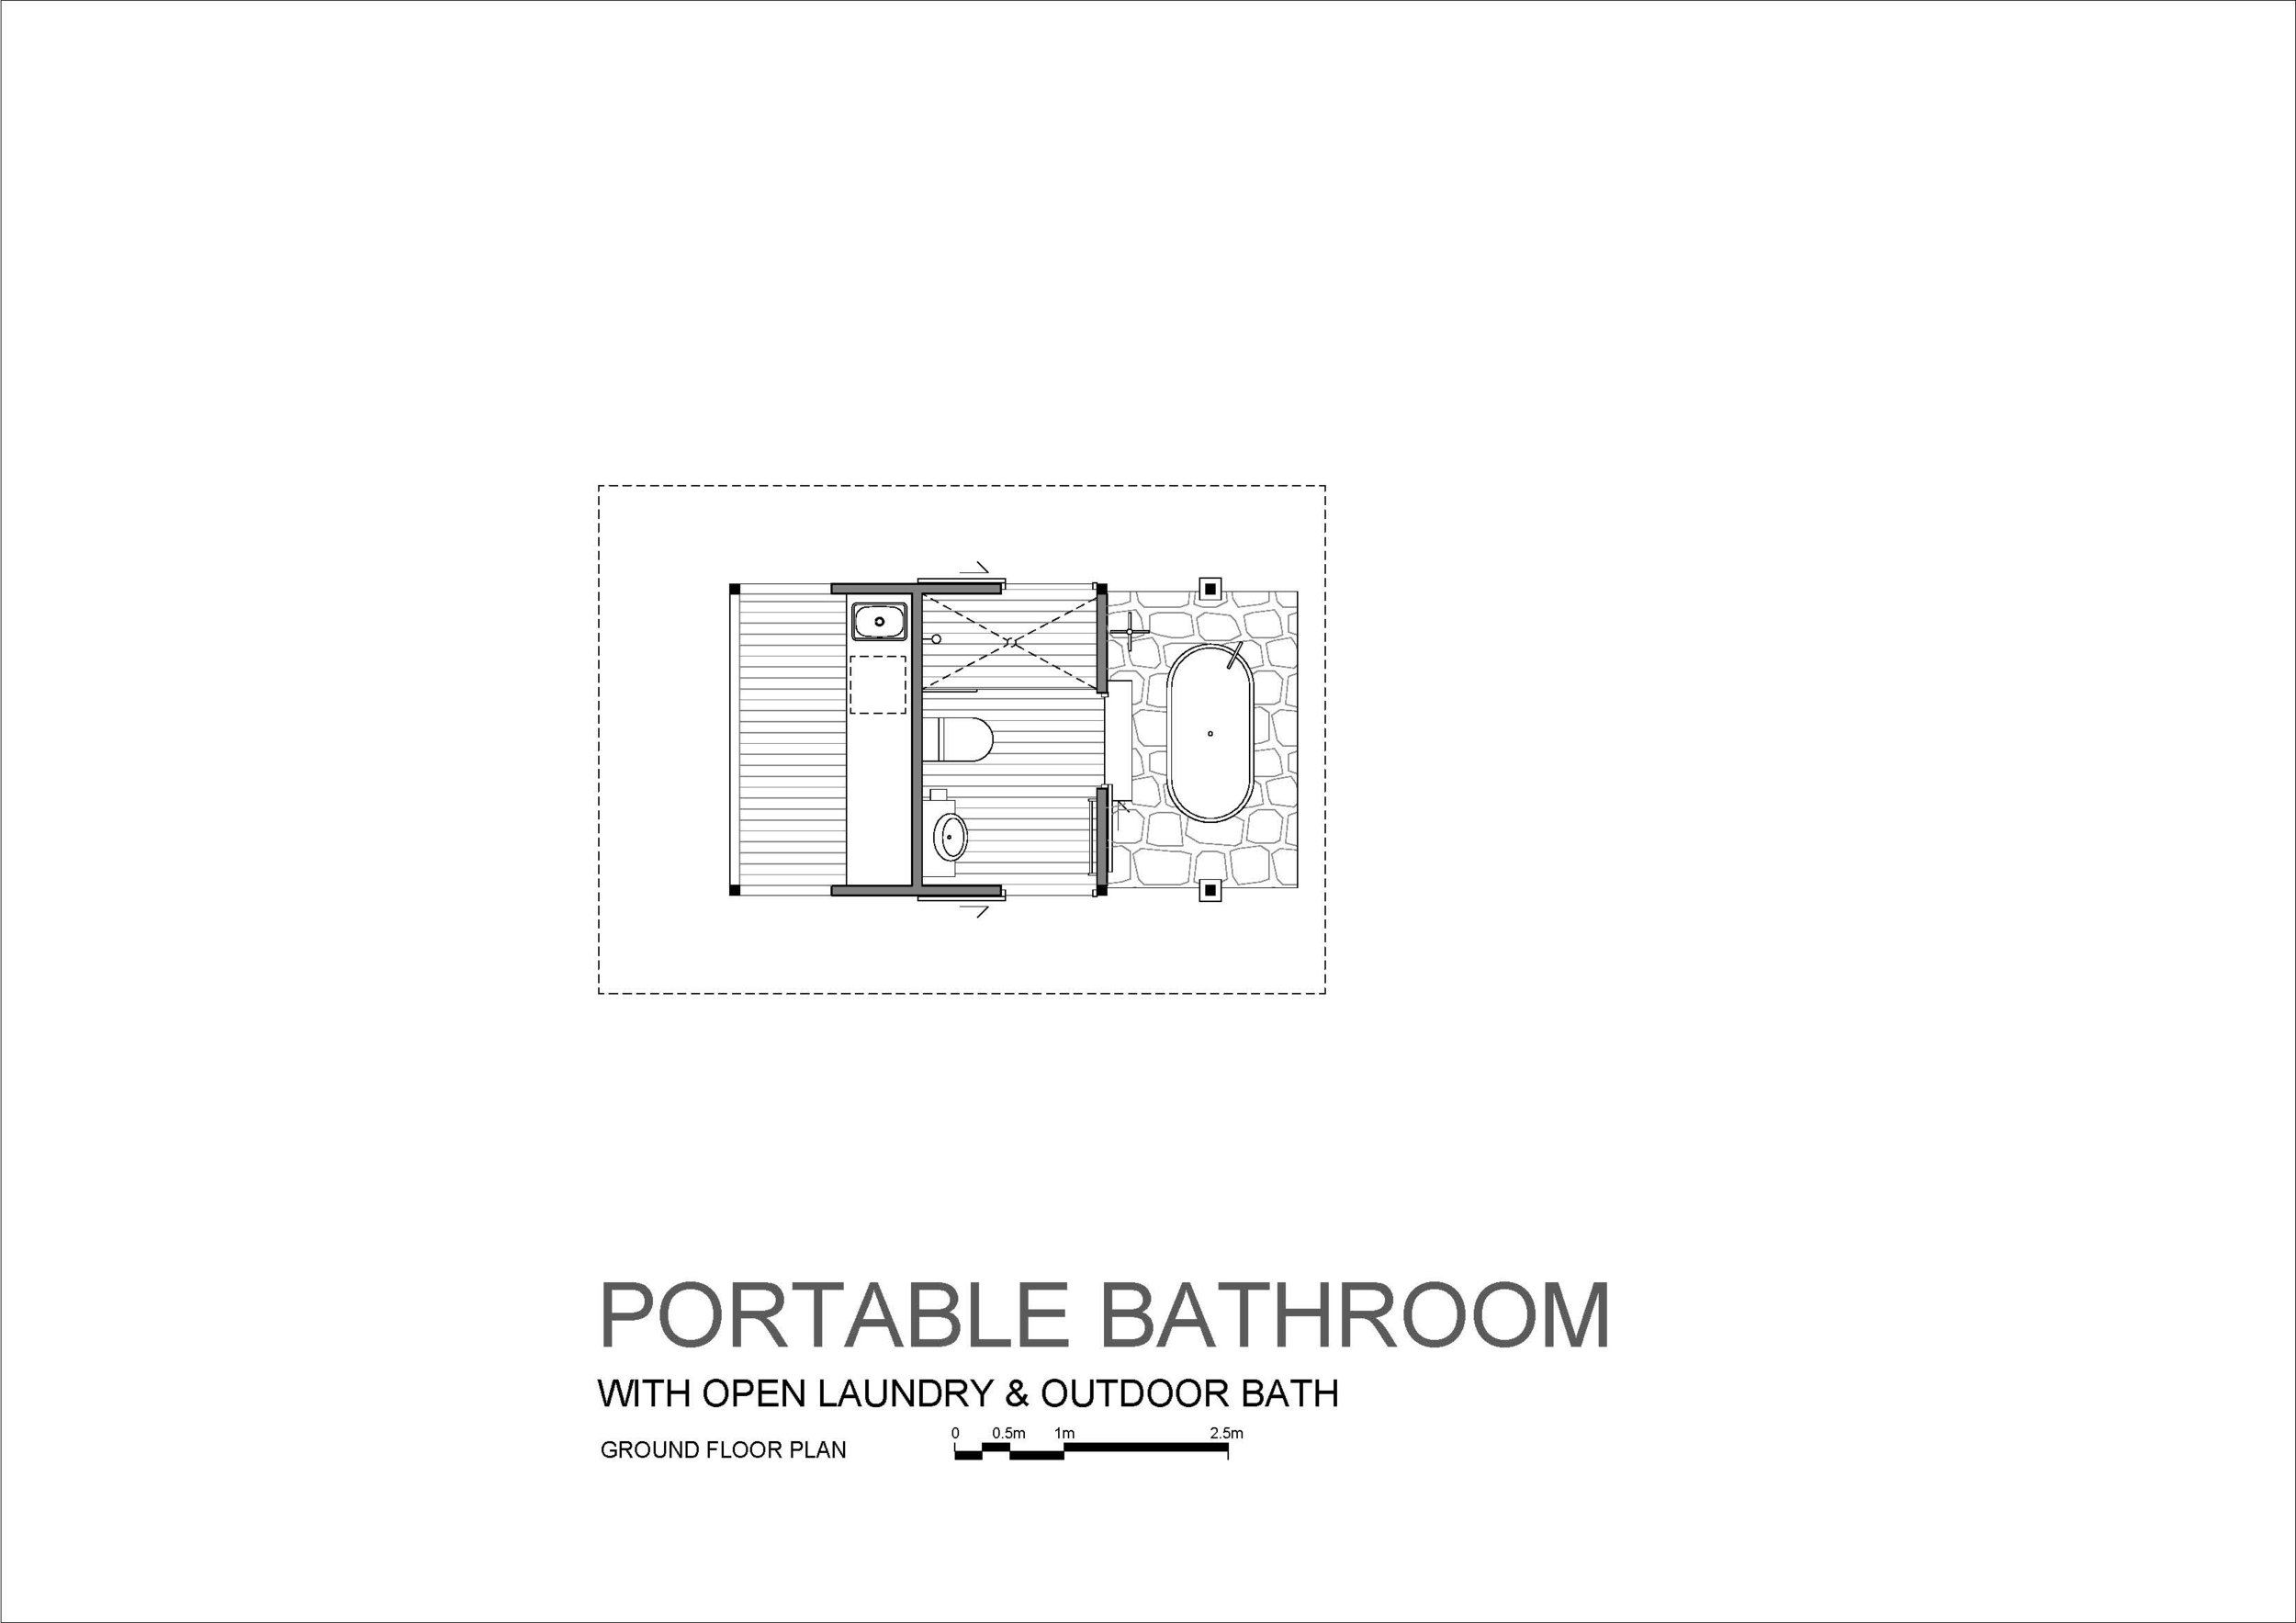 PORTABLE BATHROOM_Page_4.jpg